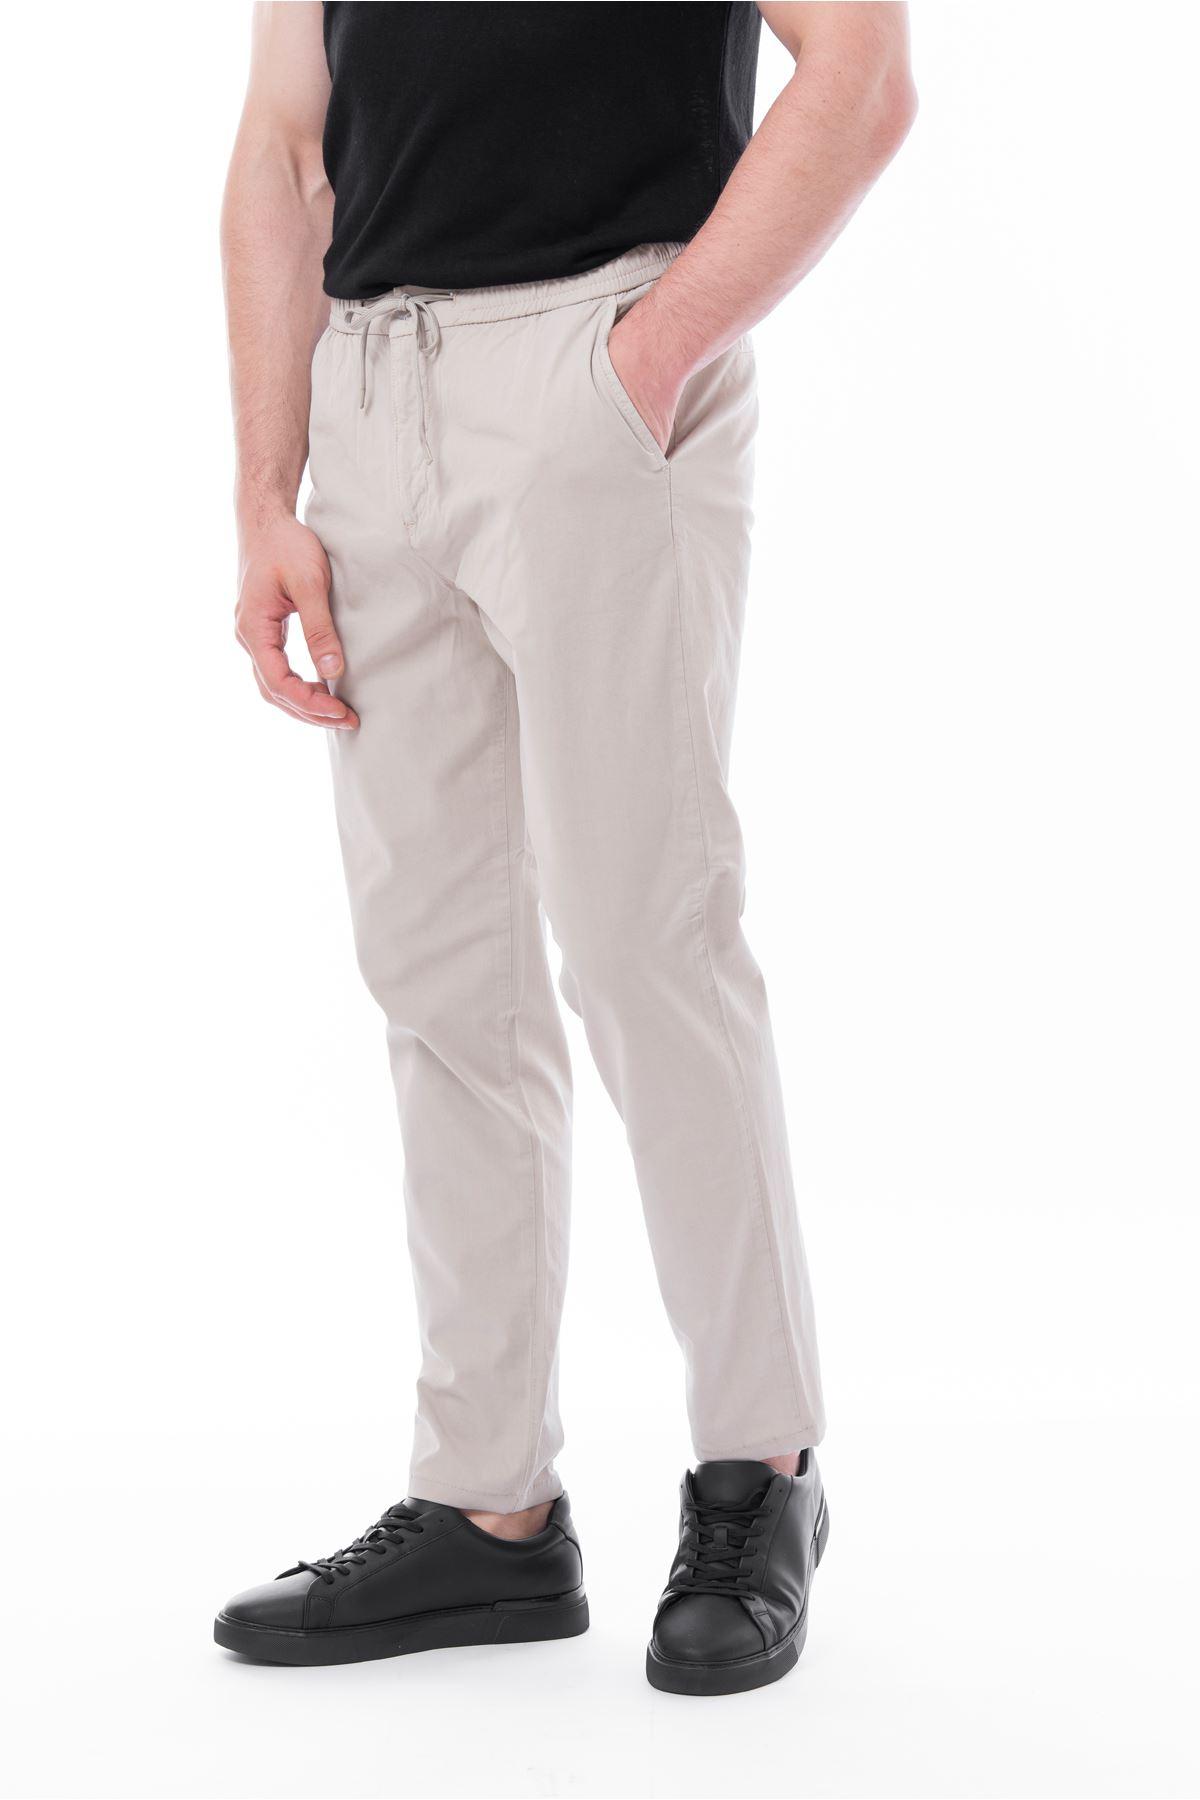 Bej Beli Lastikli Bağcıklı Jogger Pantolon